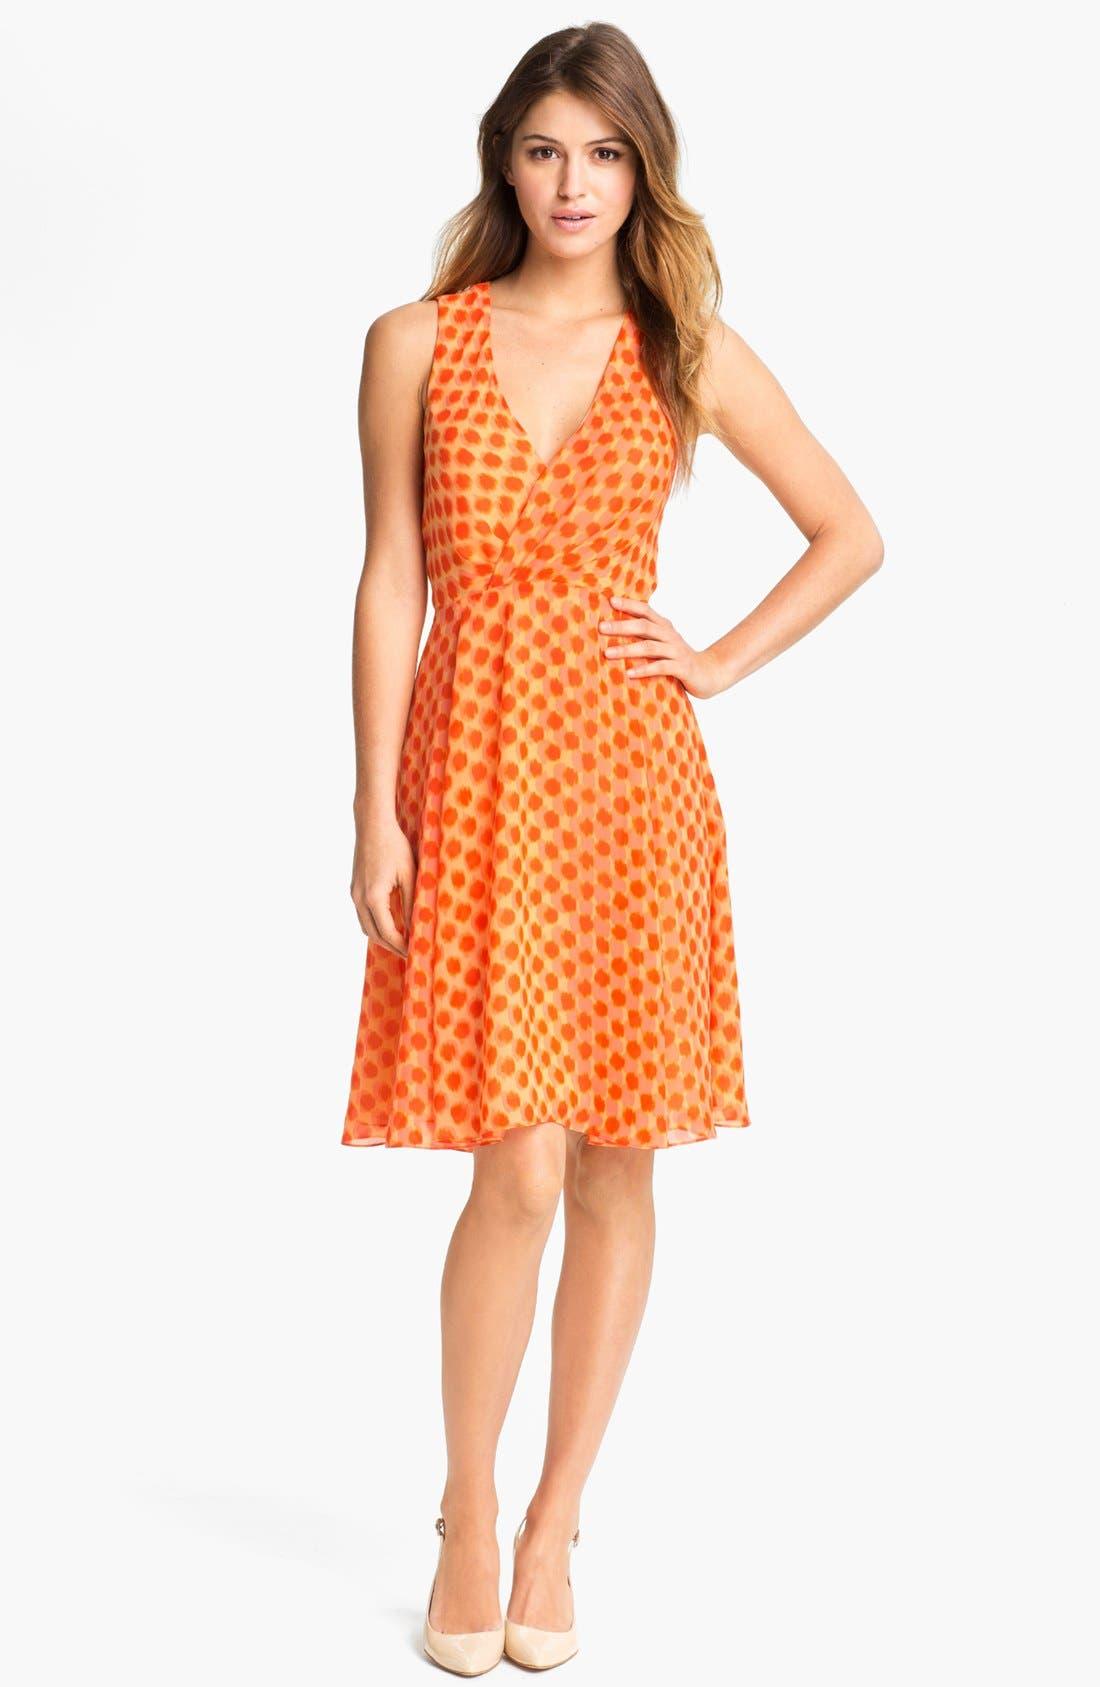 Alternate Image 1 Selected - Vince Camuto Dot Faux Wrap Dress (Petite)